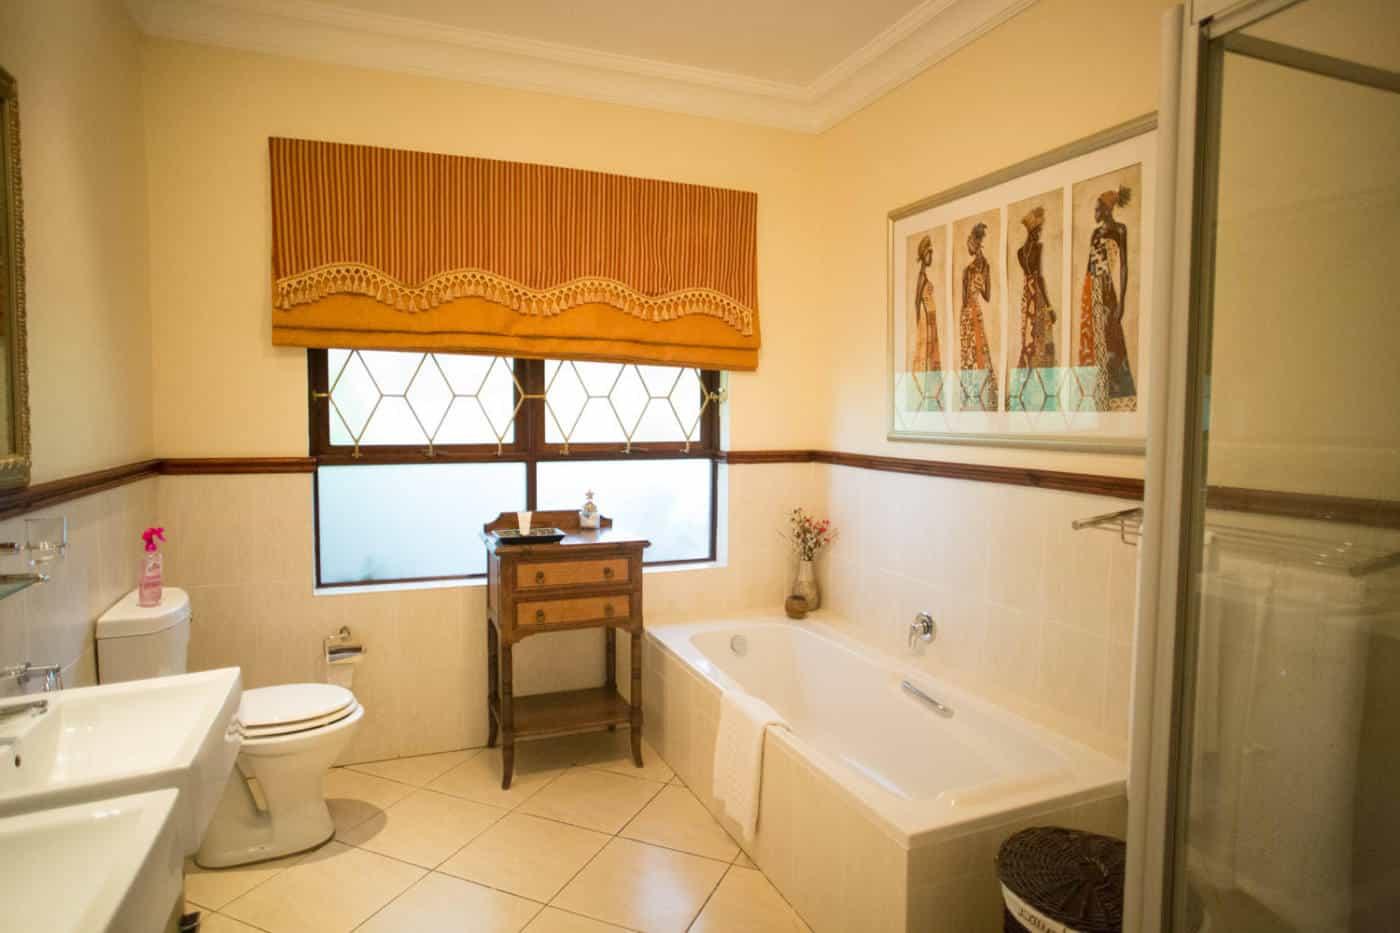 Swaziland summerfield resort bathroom